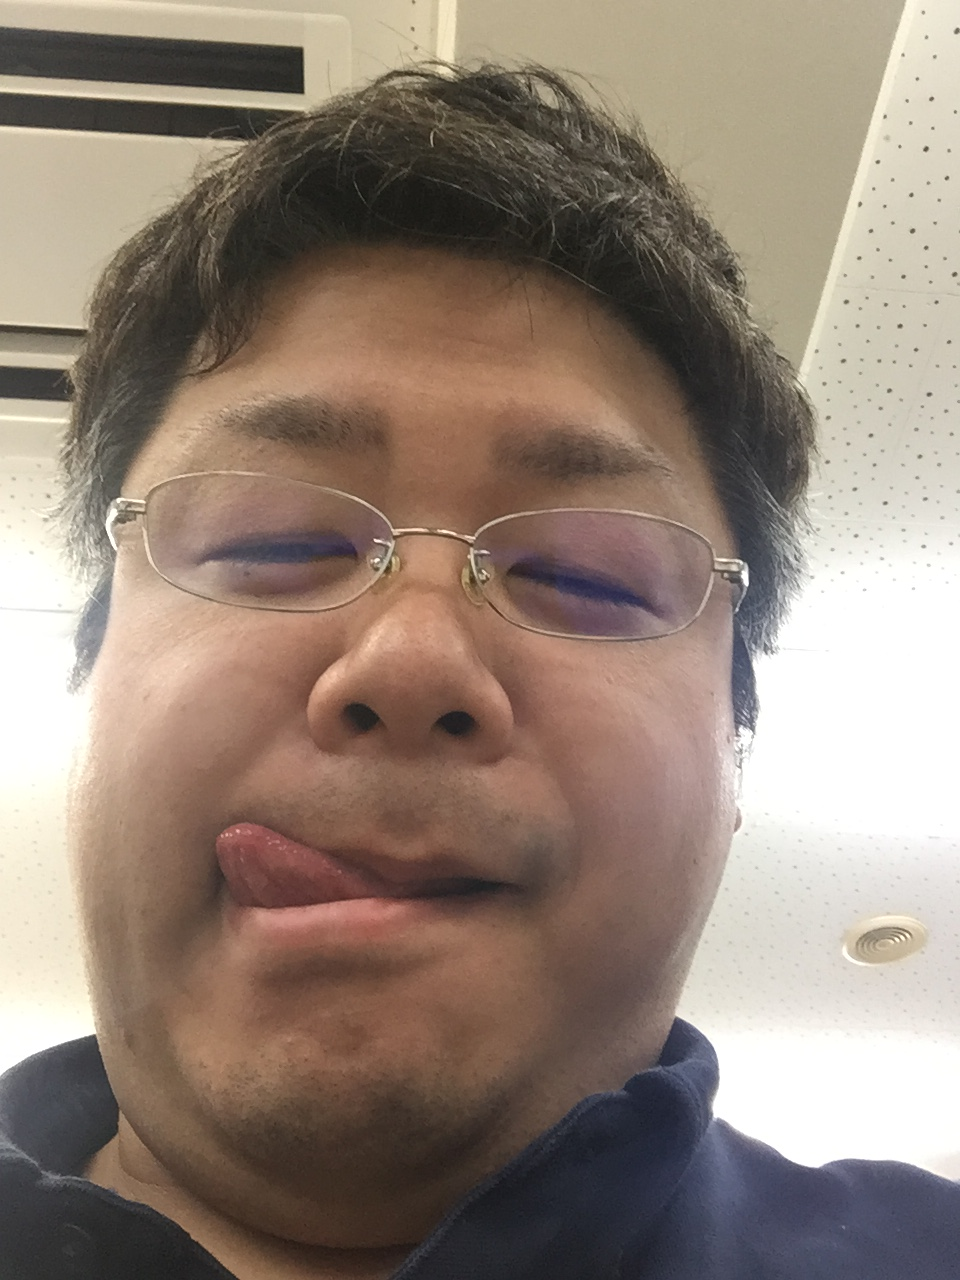 https://www.r-ac.jp/campus/osaka/blog/img/eee.JPG